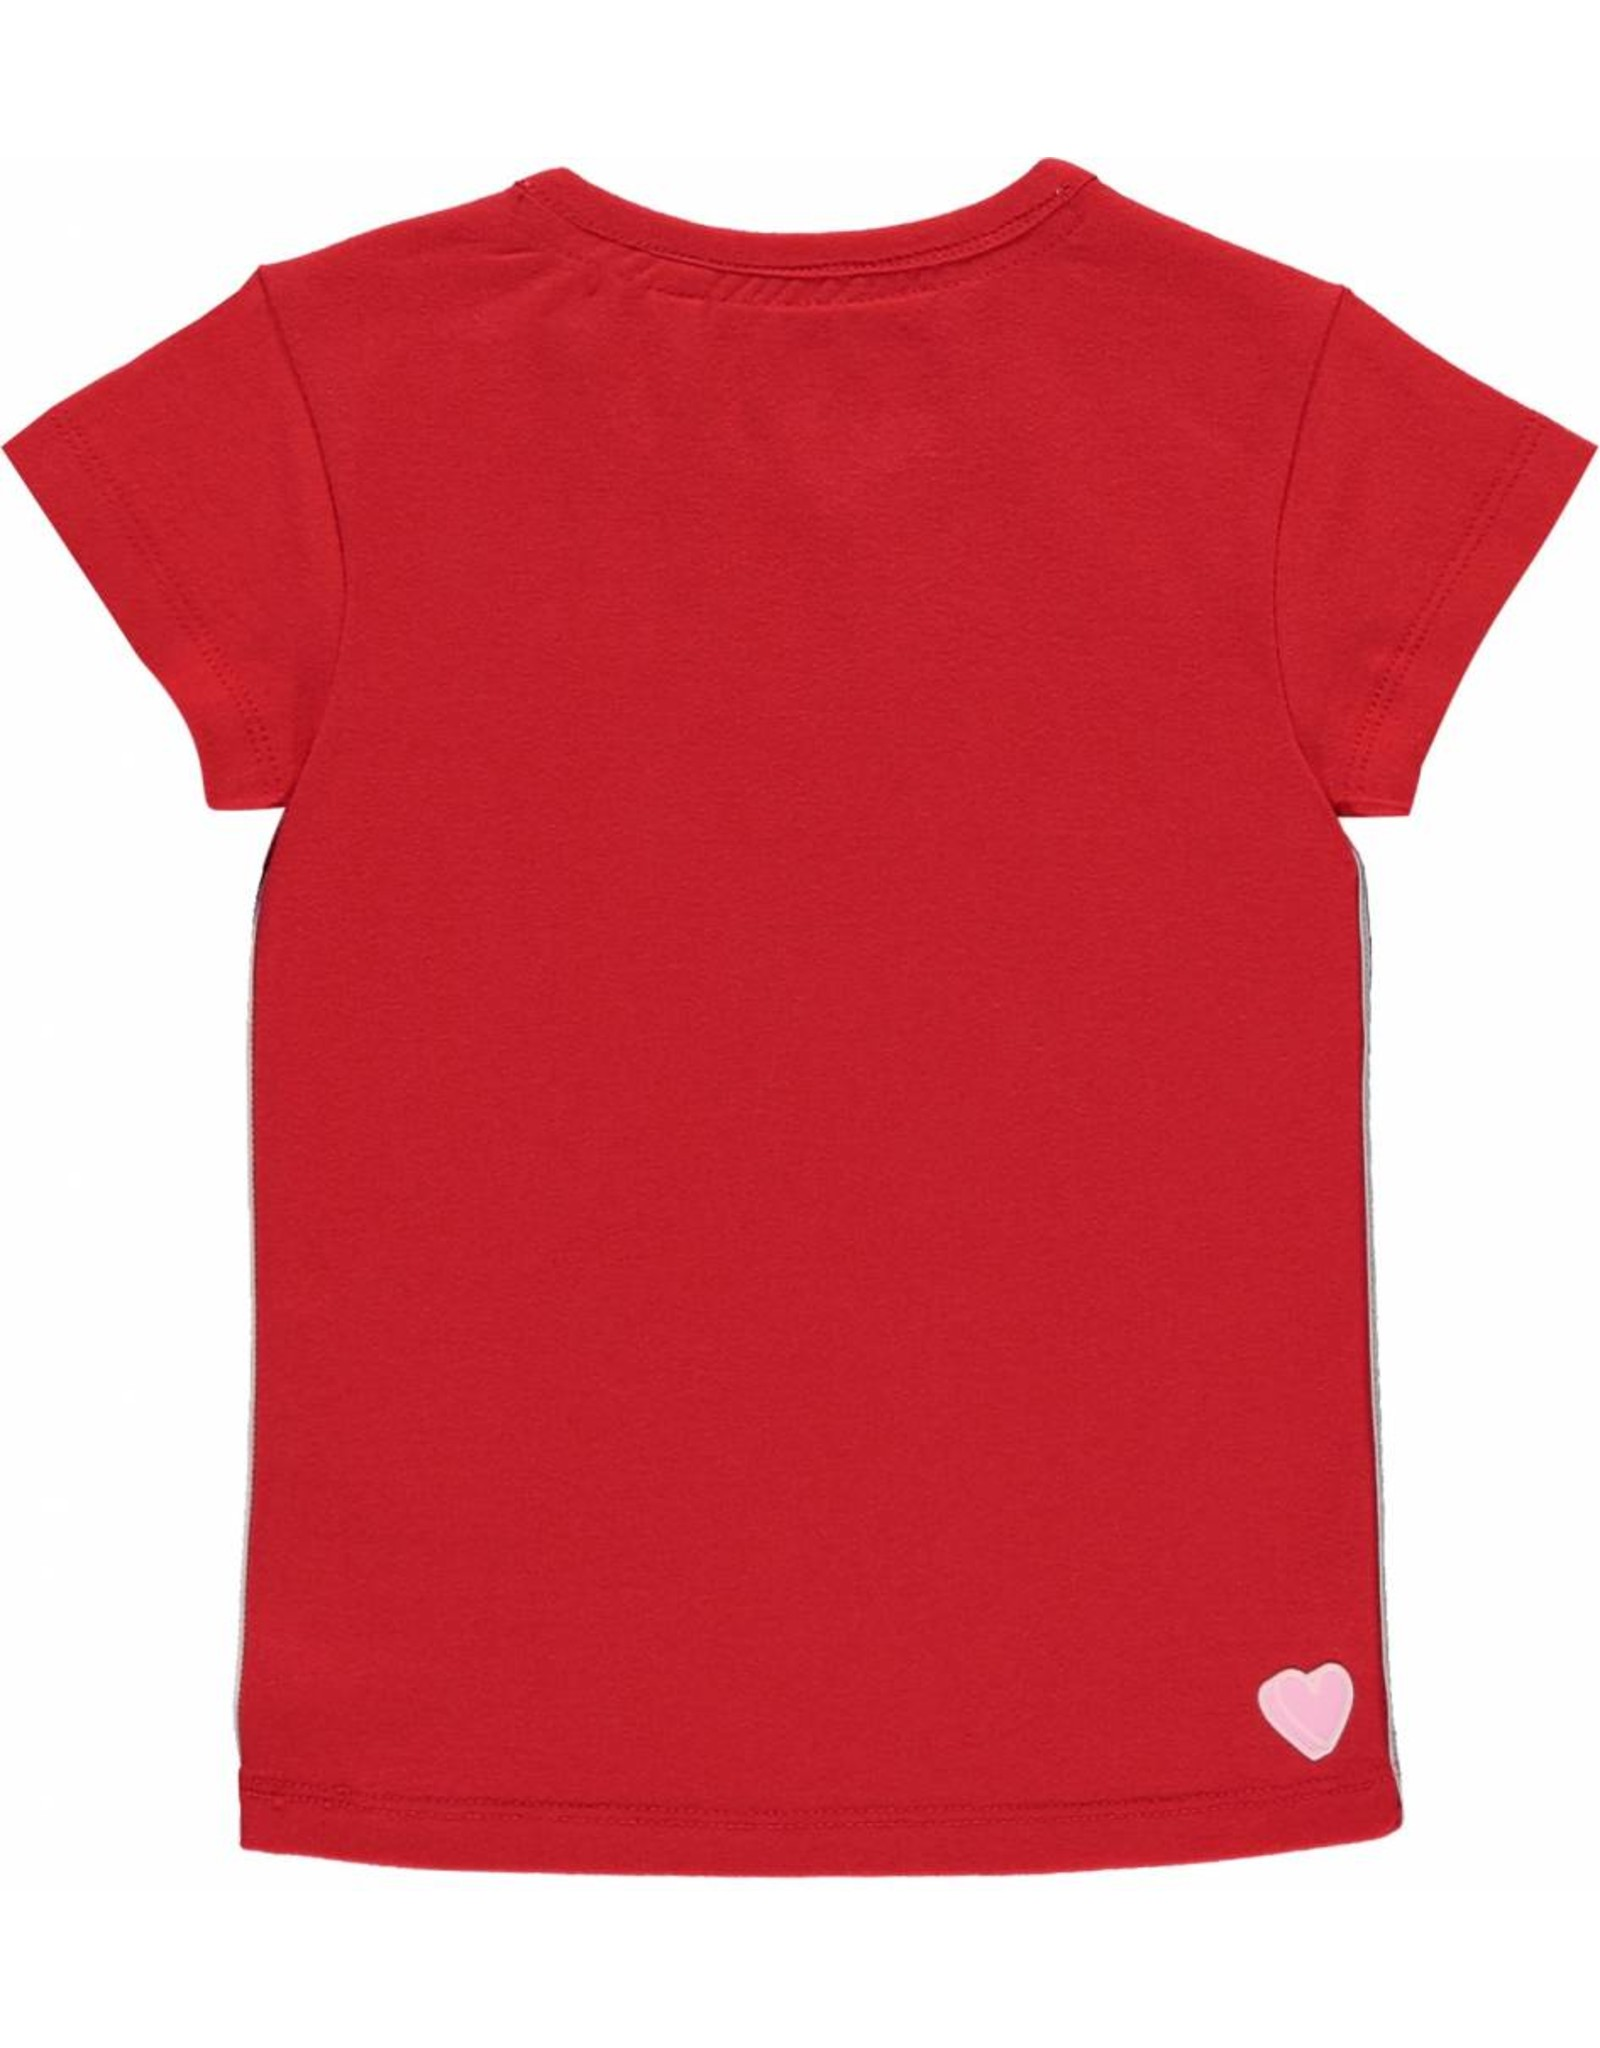 Quapi Quapi baby meisjes t-shirt Roma